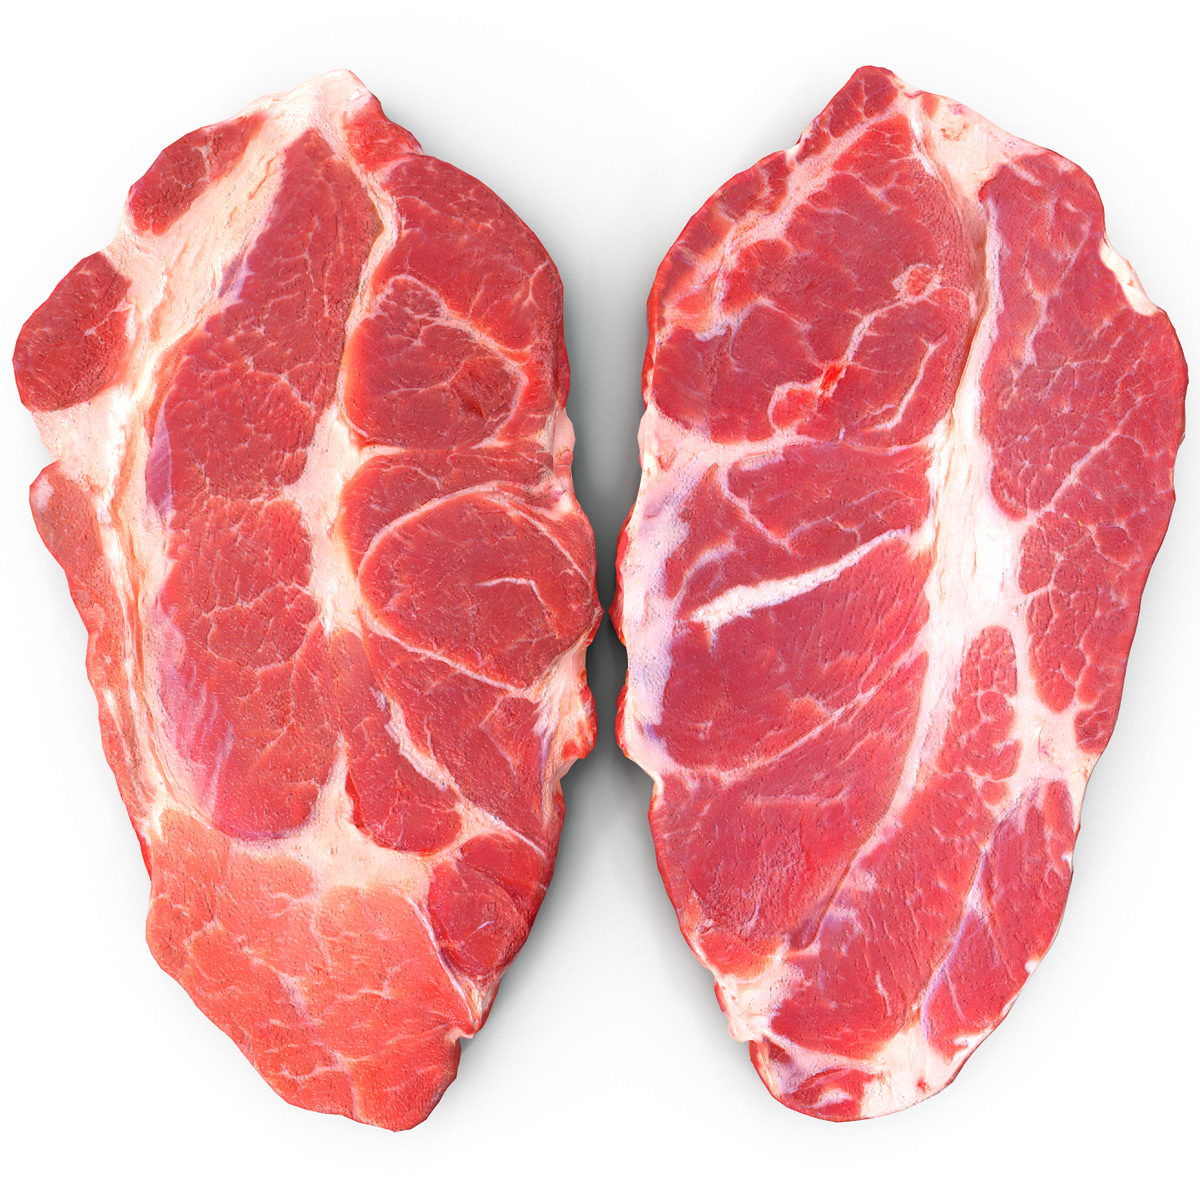 Steak with SSS2_6.jpg